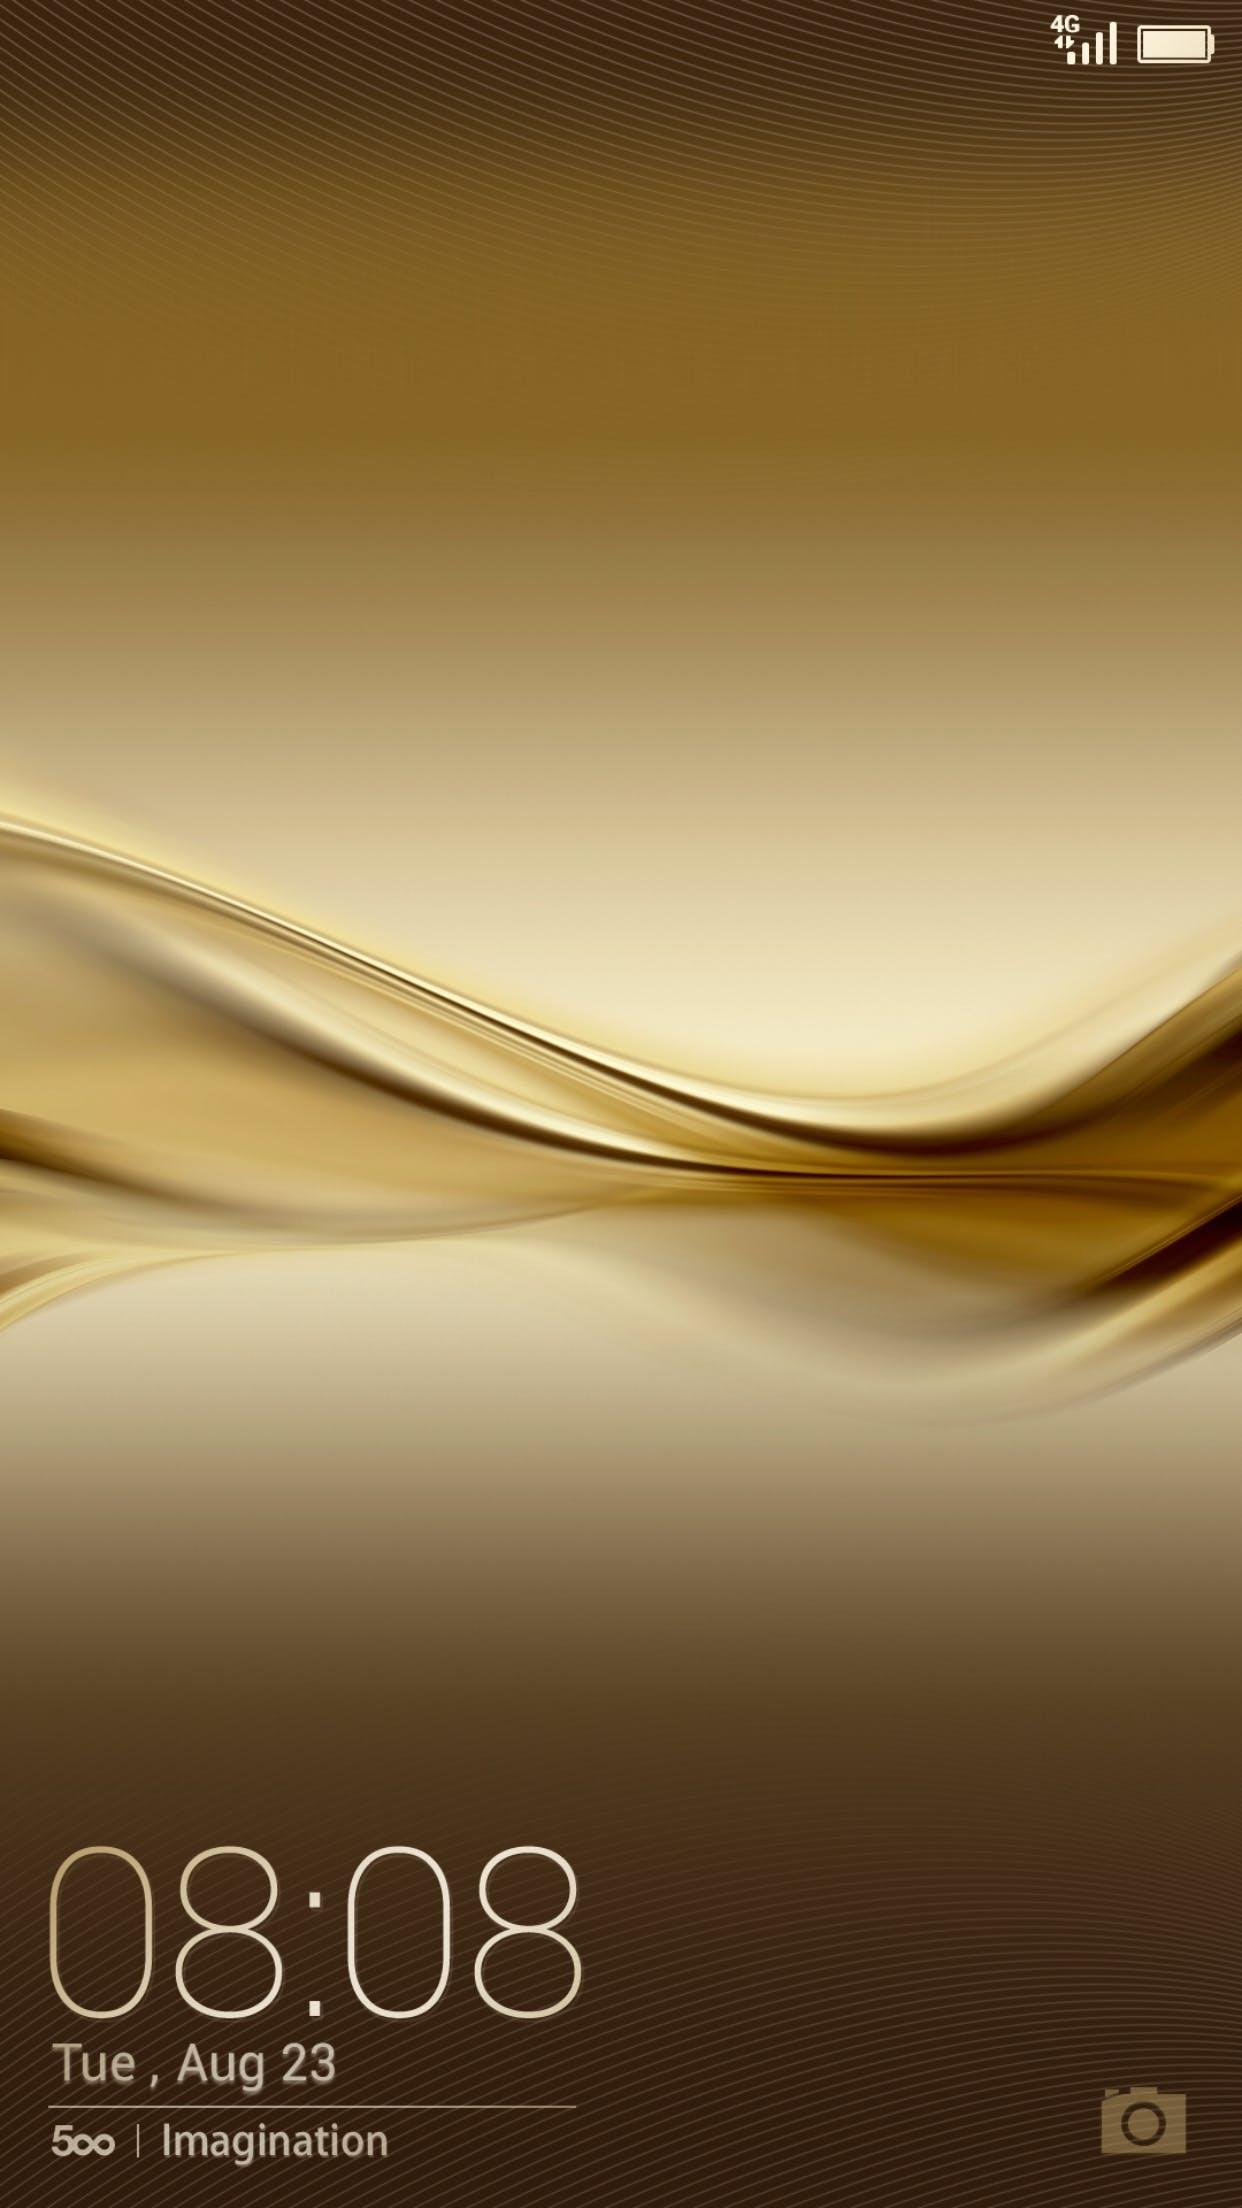 Free stock photo of Huawei Gold Theme